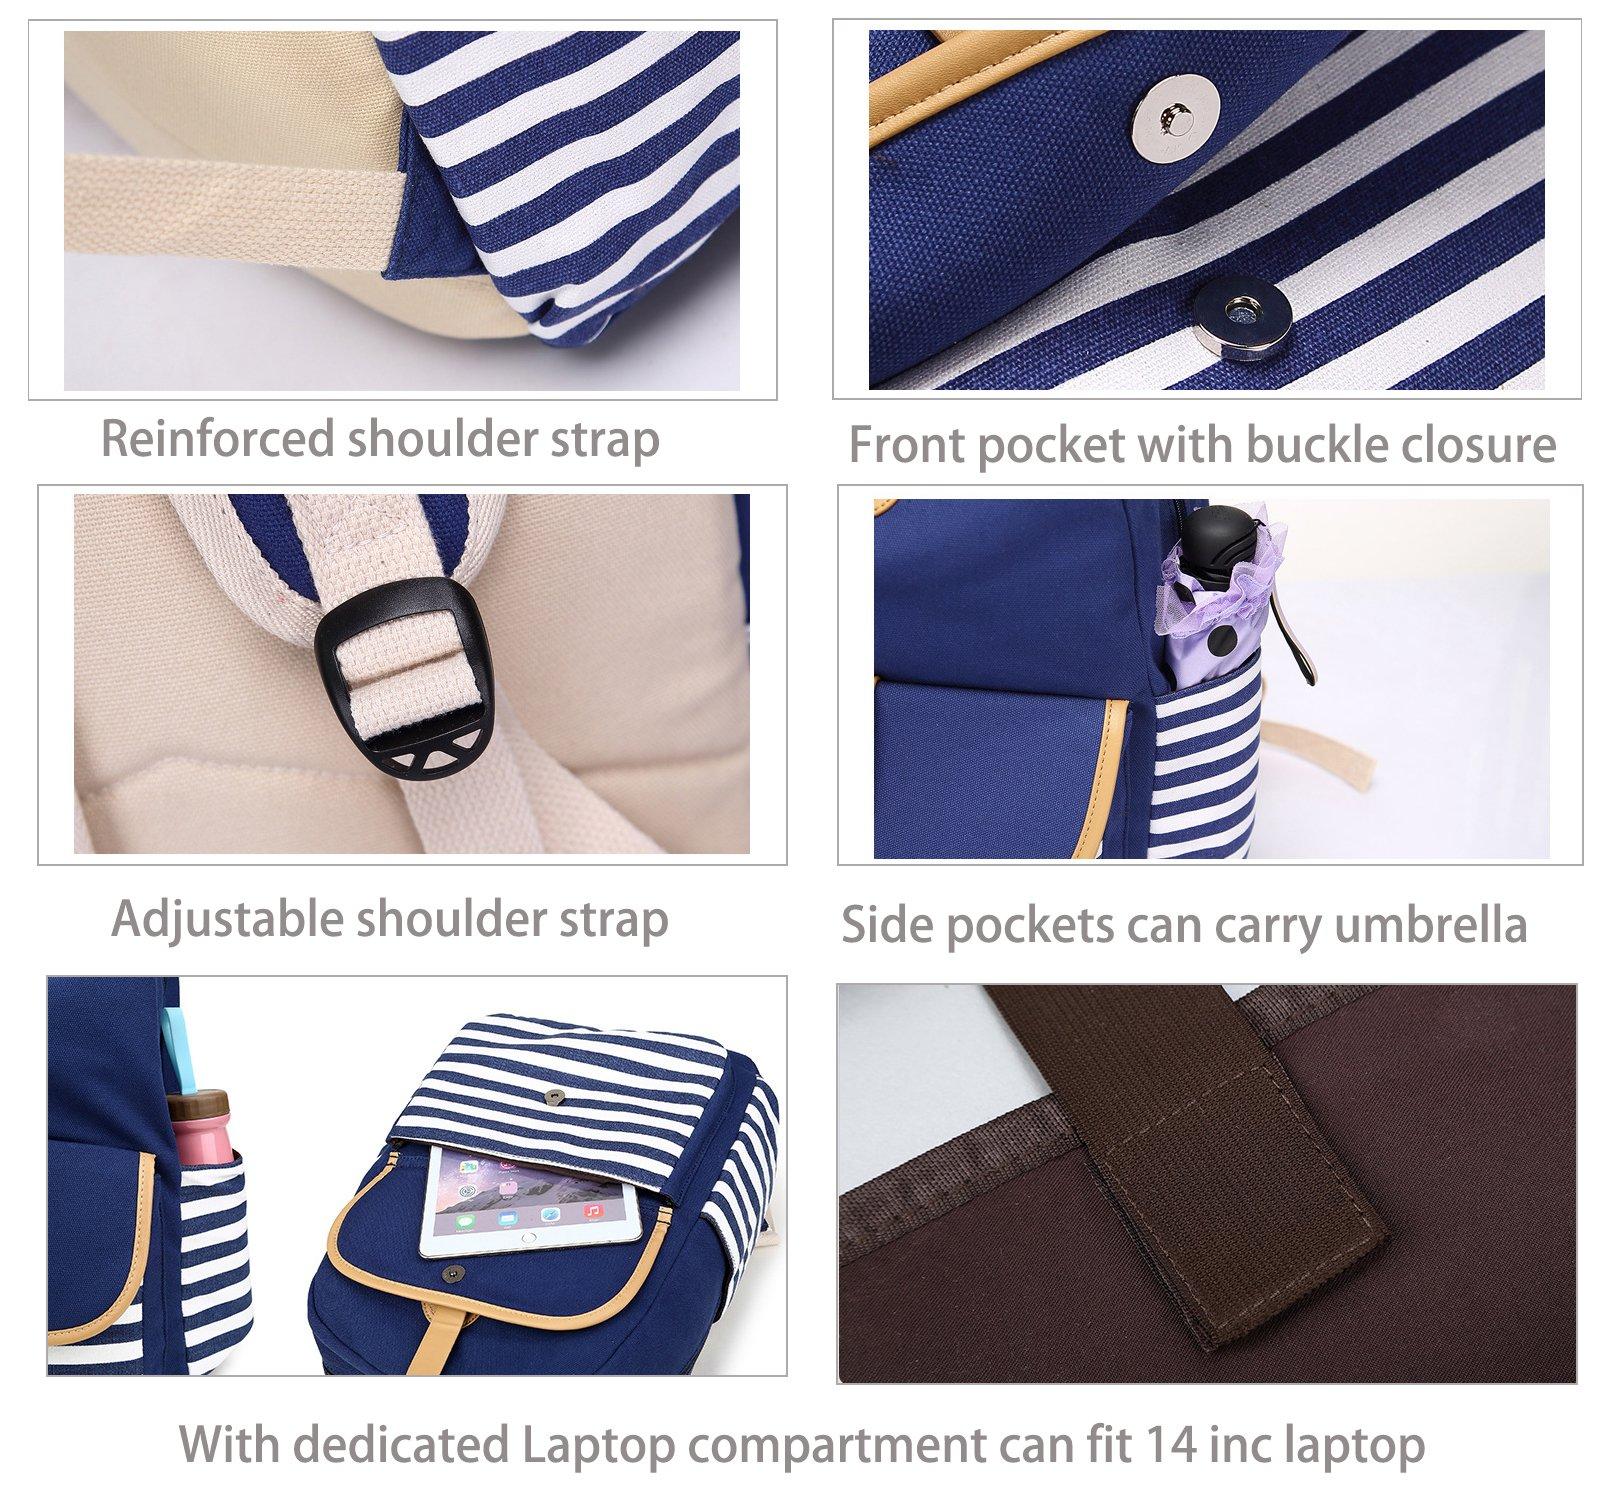 Abshoo Causal Travel Canvas Rucksack Backpacks for Girls School Bookbags (Navy) by abshoo (Image #3)